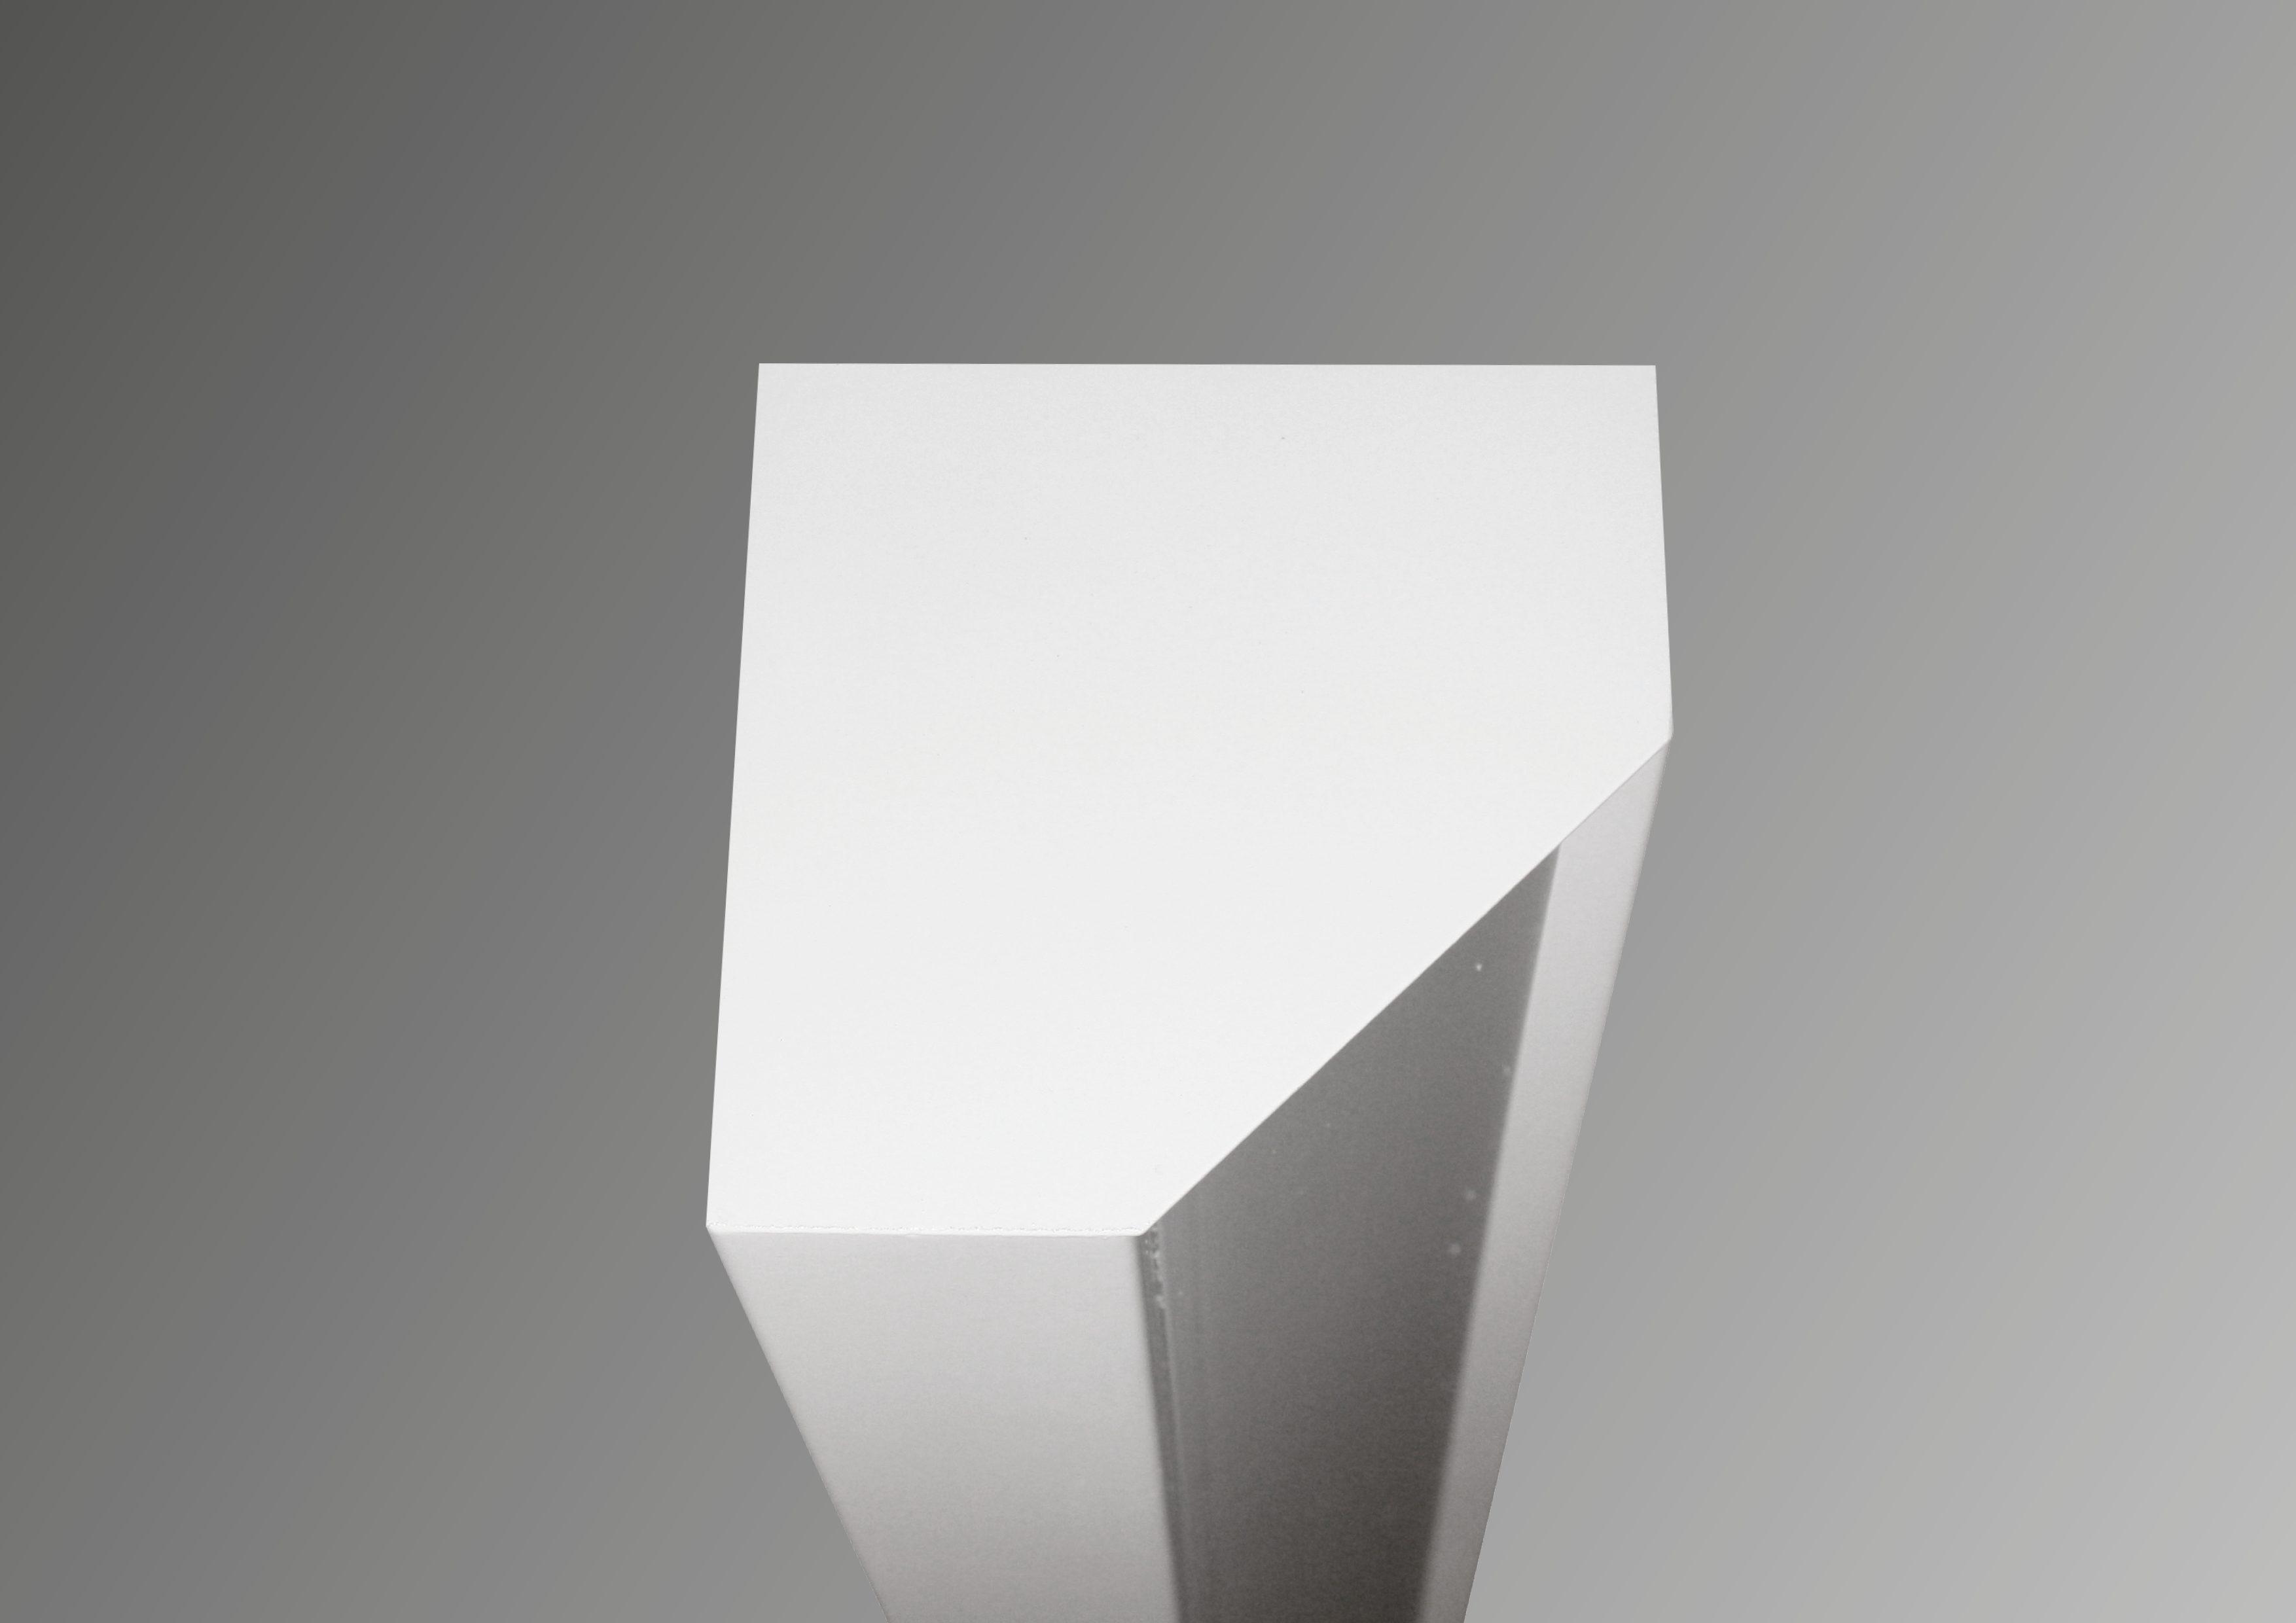 https://contrac-lighting.co.uk/wp-content/uploads/2019/03/CORNICO-END-e1551956388713.jpg